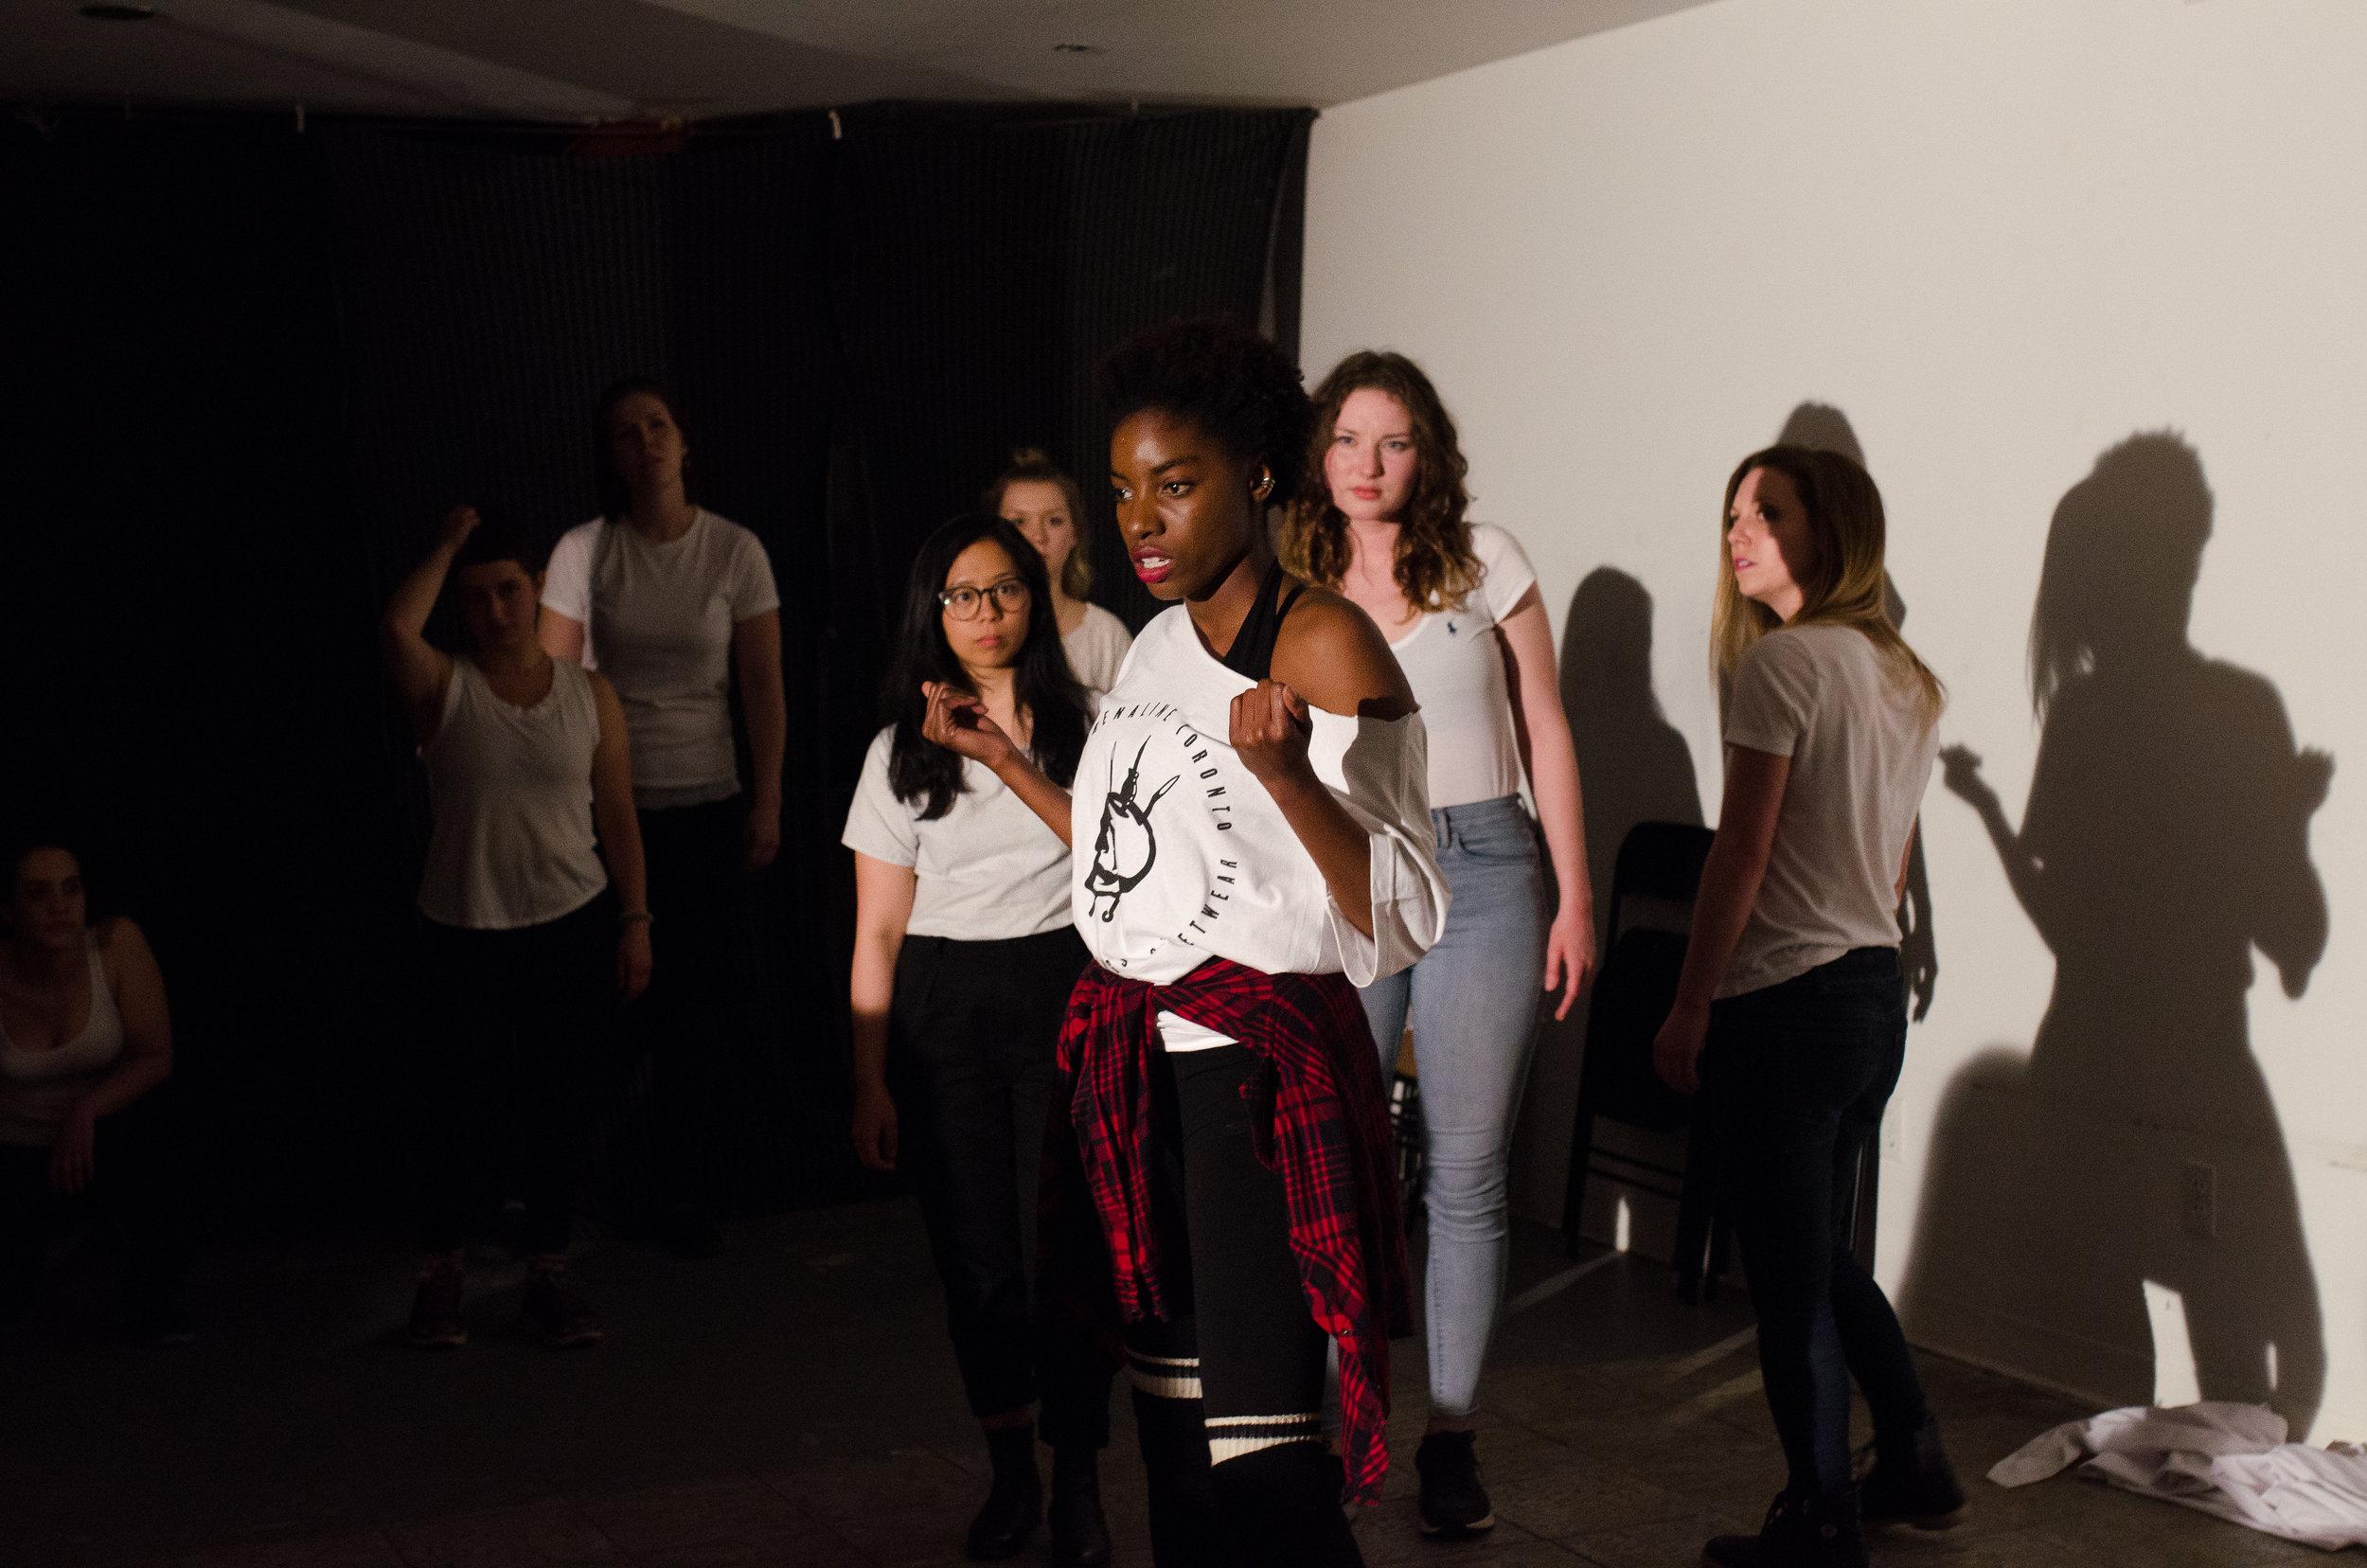 Participant Alia Ettienne Delivers a poignant monologue (Photo: Samantha Polzin)